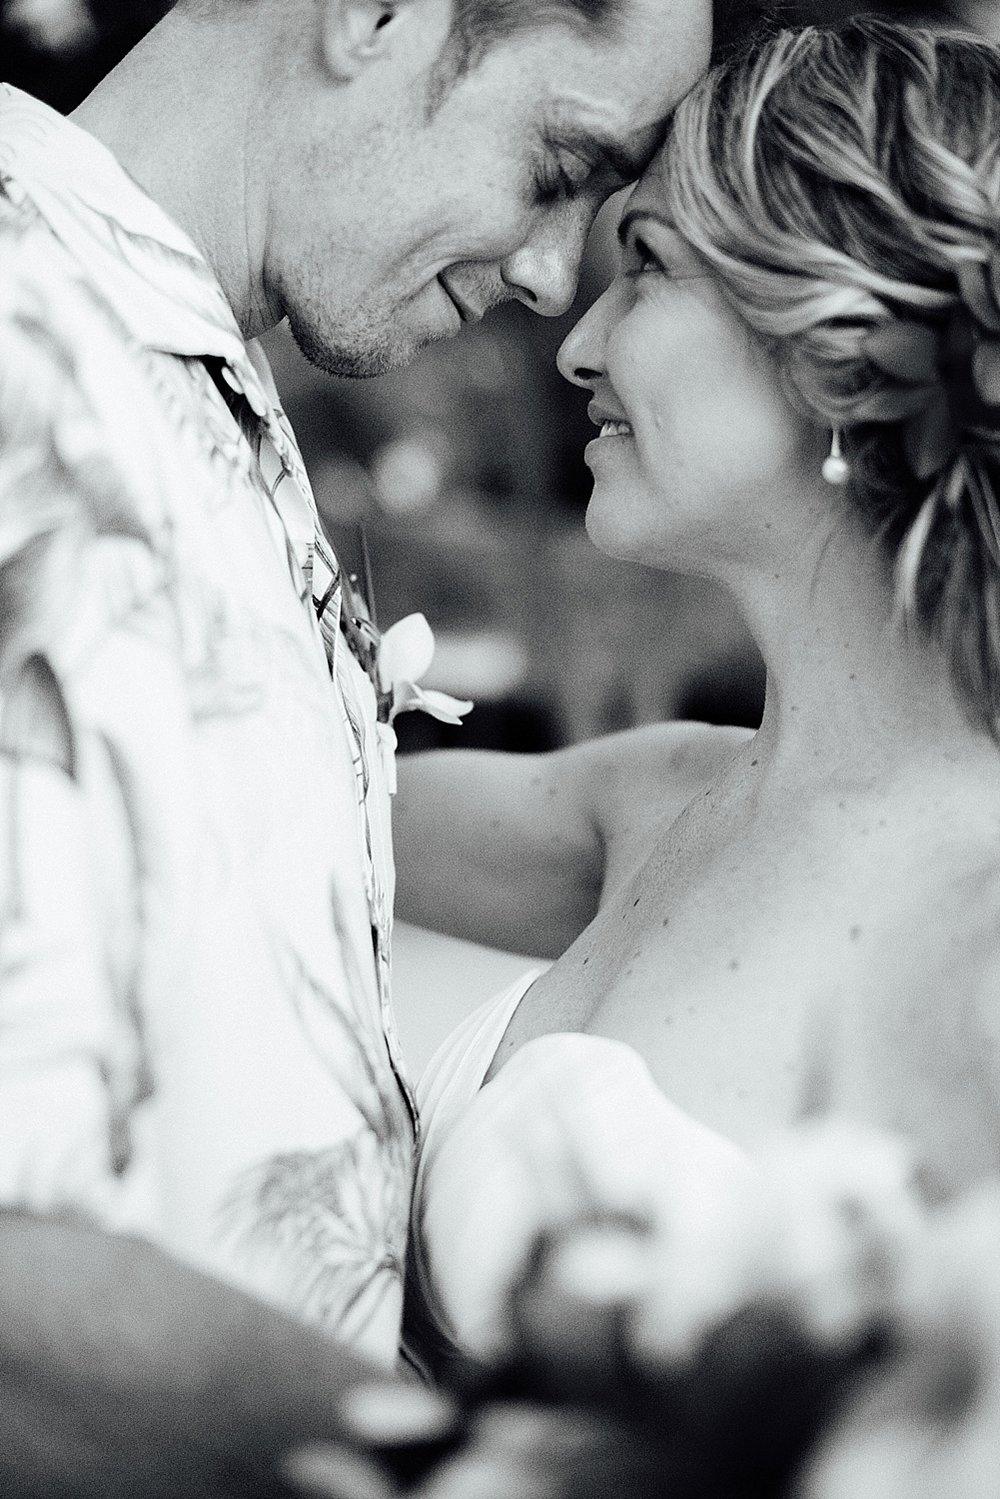 ErakorIslandKylie-Dave-WeddingPhotography-GroovyBanana-VanuatuPhotographers_0015.jpg